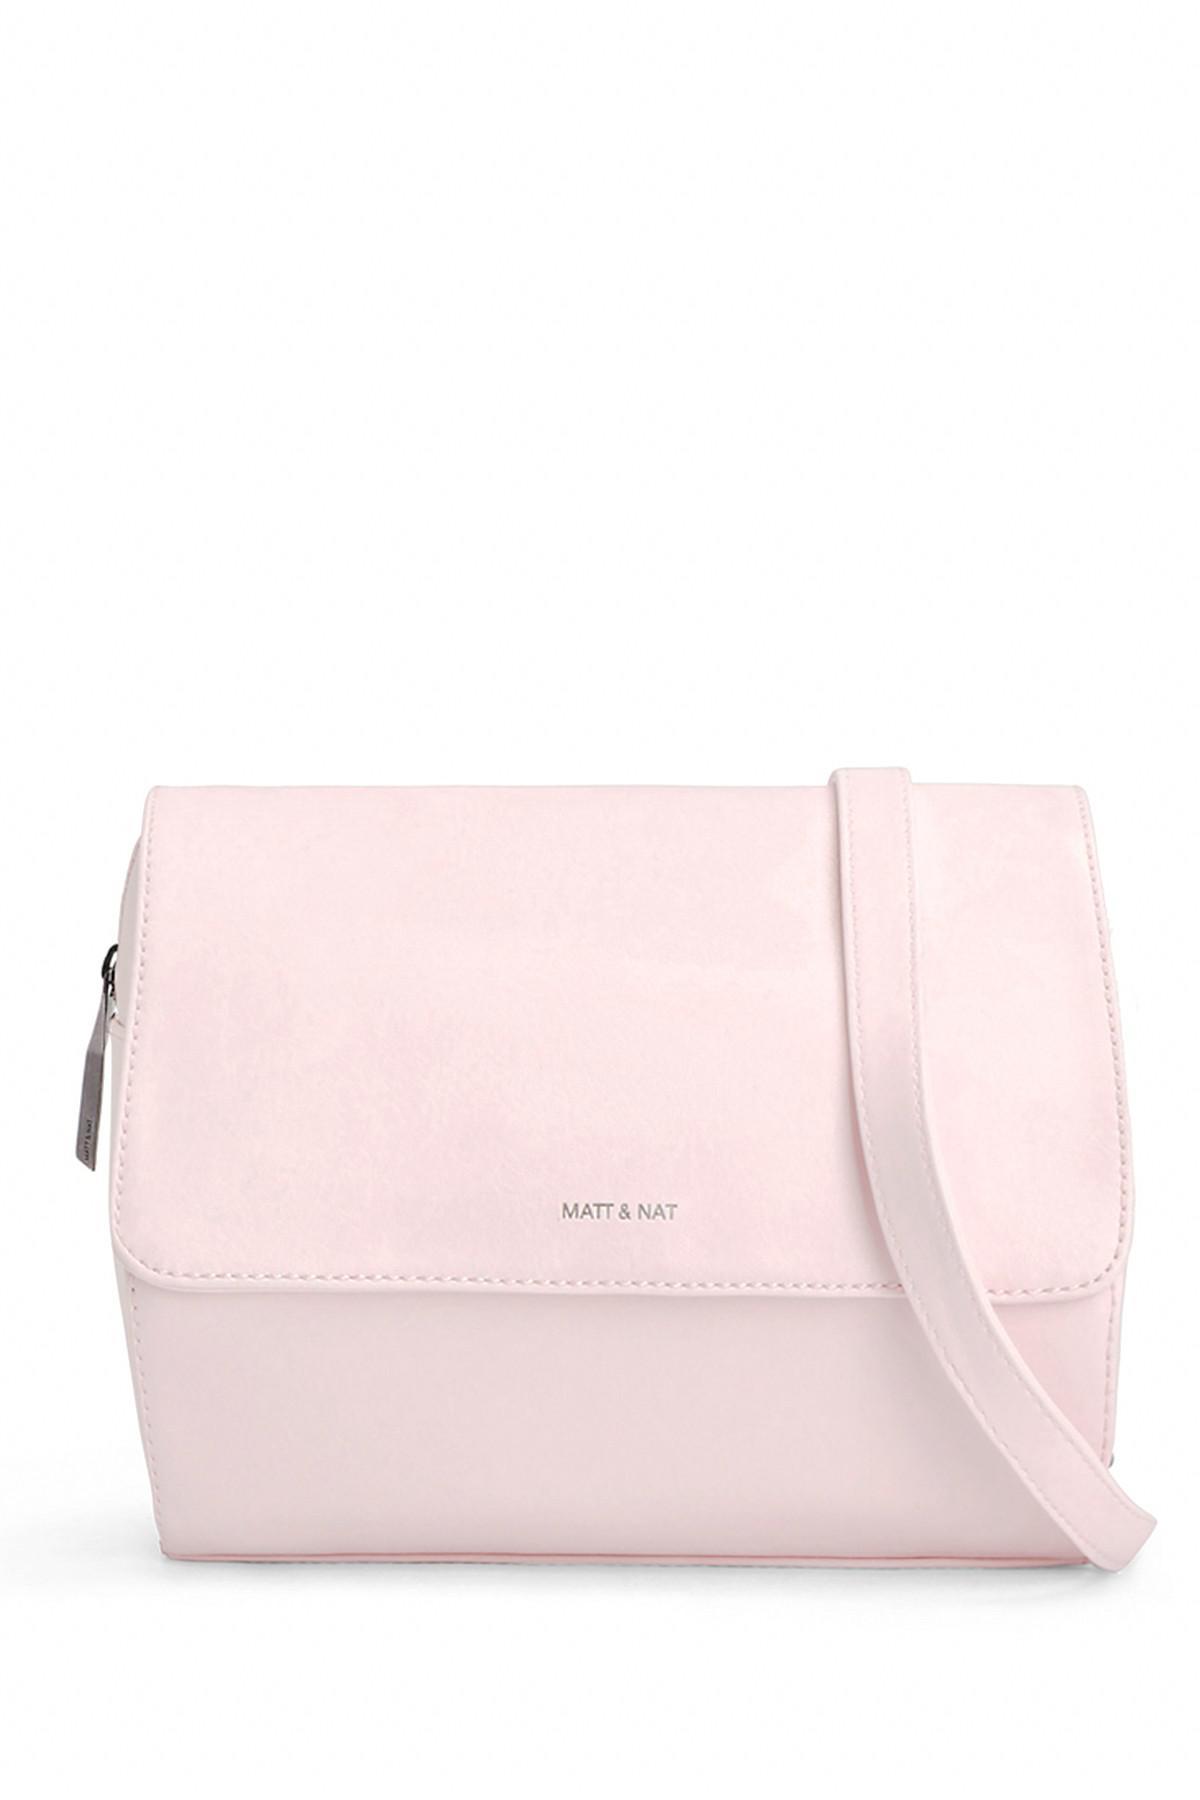 0d23c7127 Matt & Nat Phi Cycle Commuter Vegan Leather Crossbody Bag in Pink - Lyst